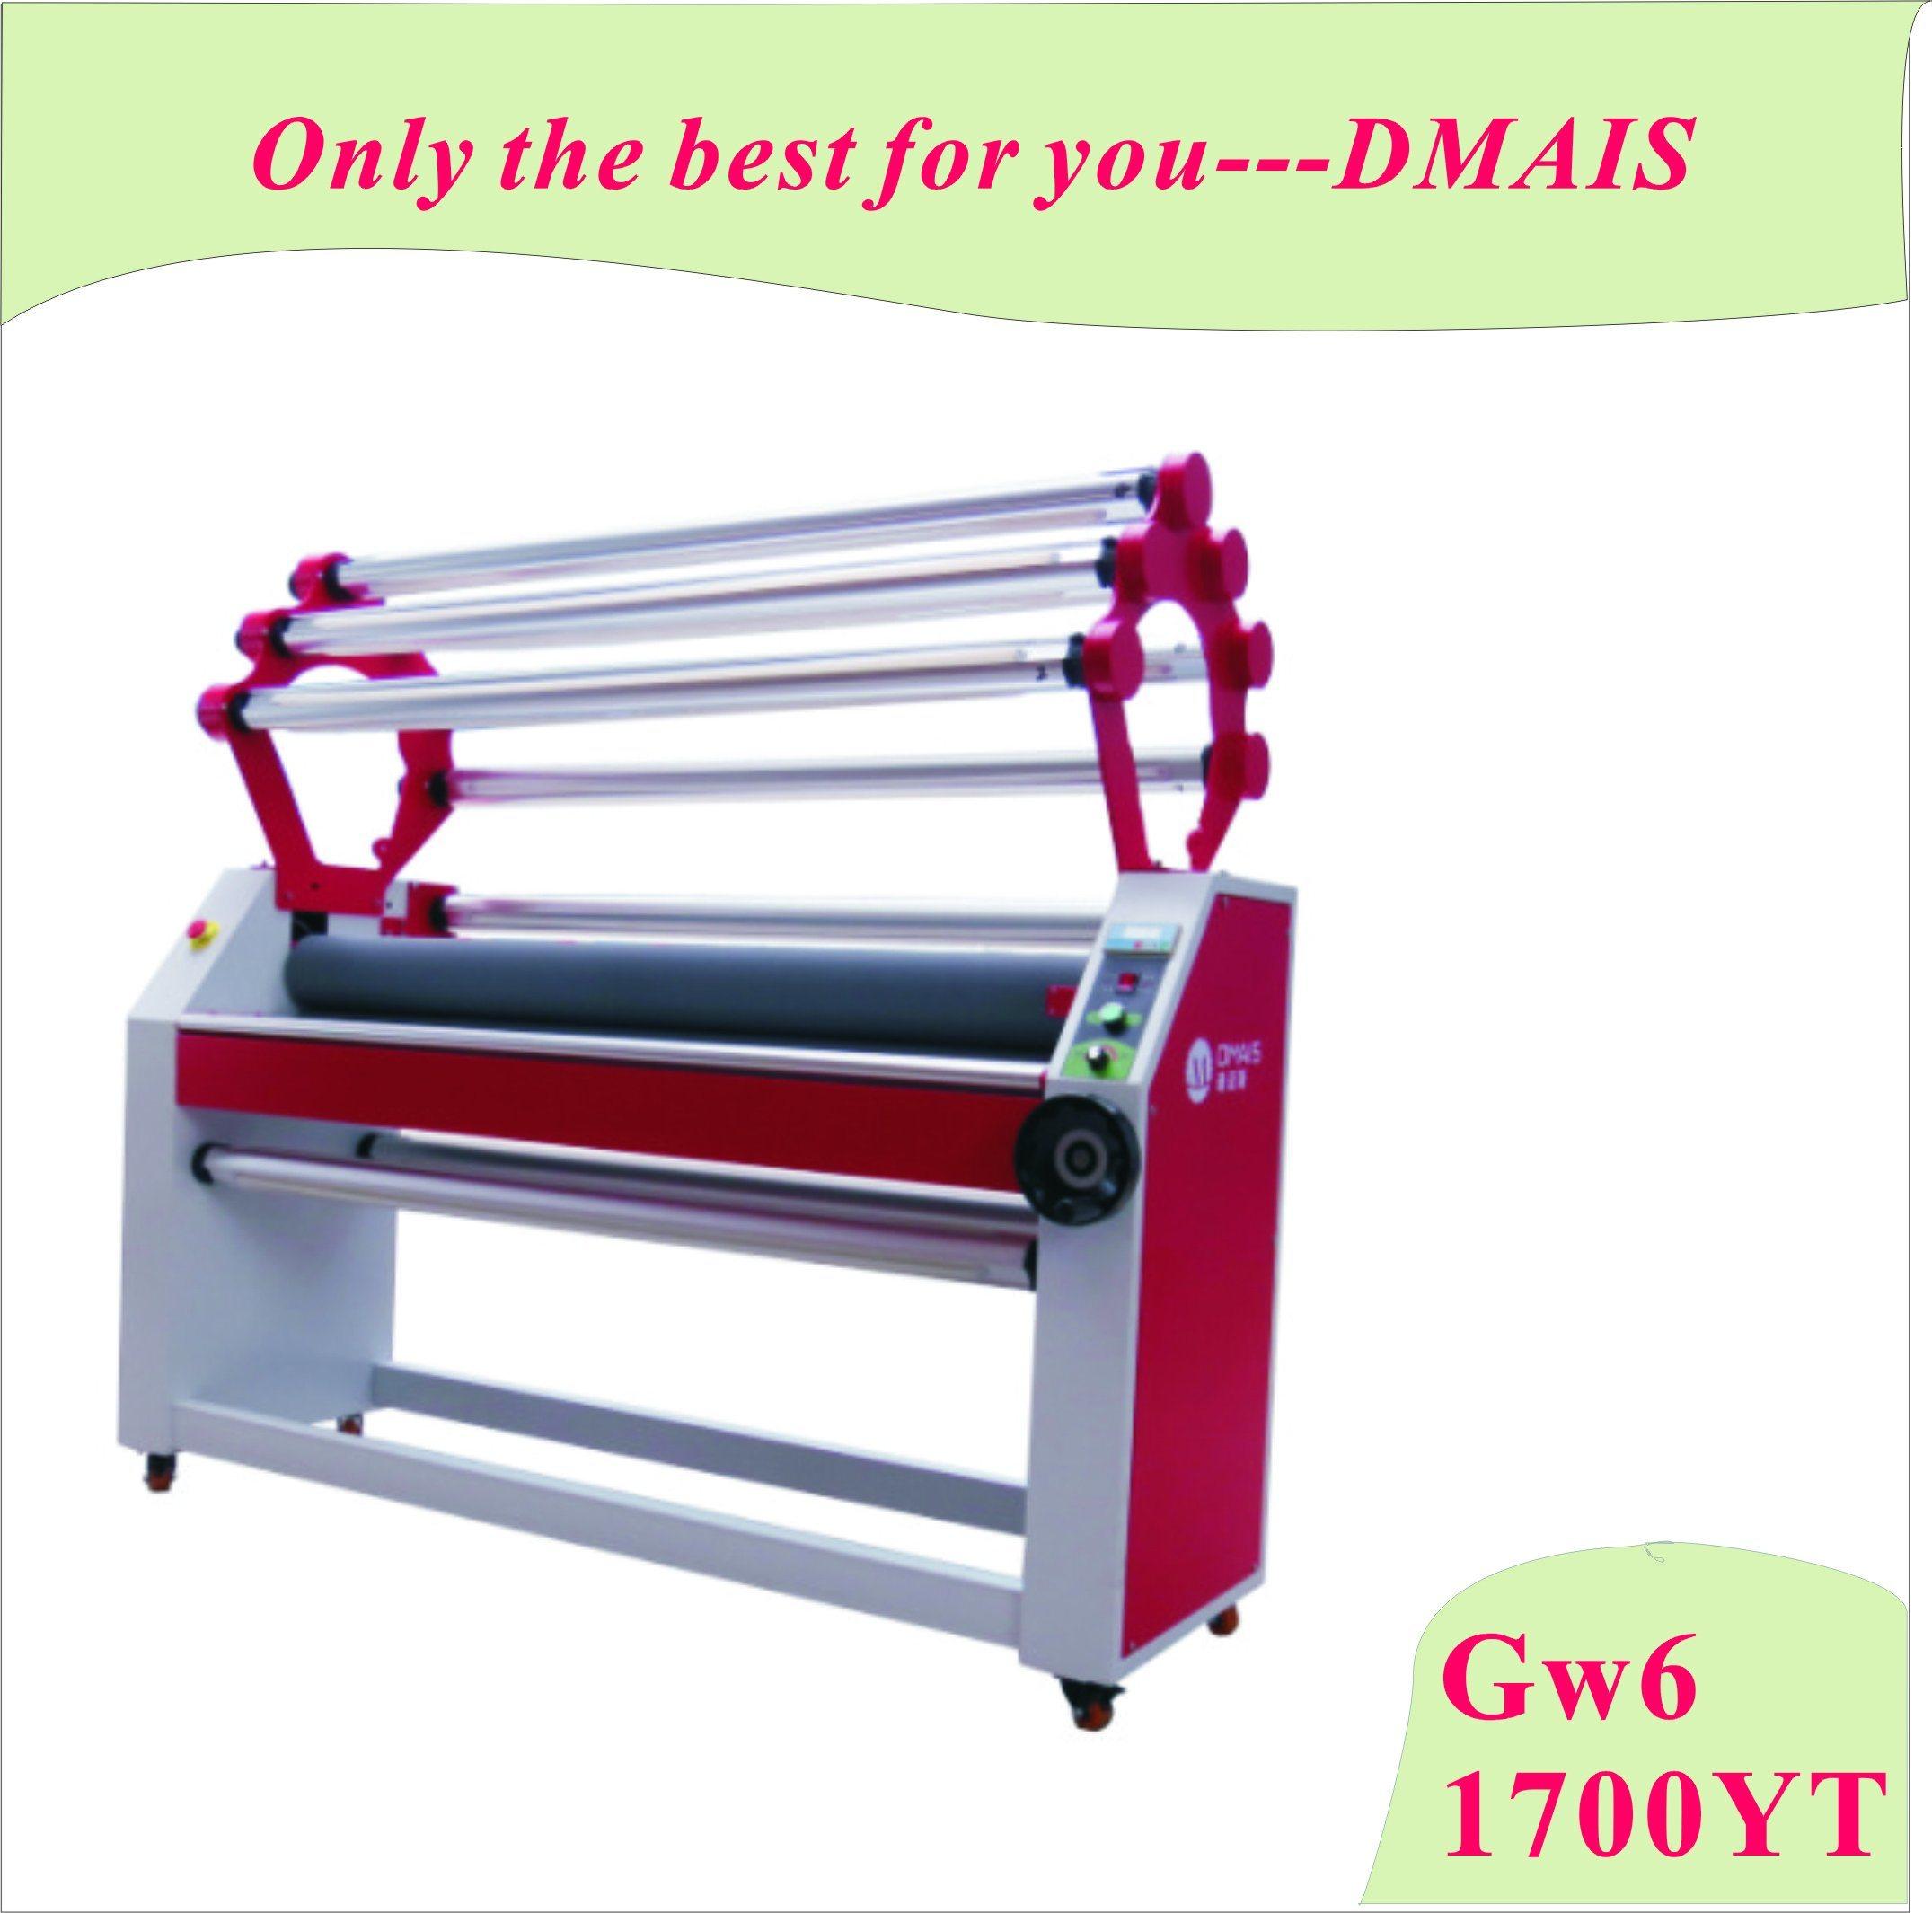 Gw6-1700yt Full Automatic Roll Laminator 6 Roller Laminating Machine